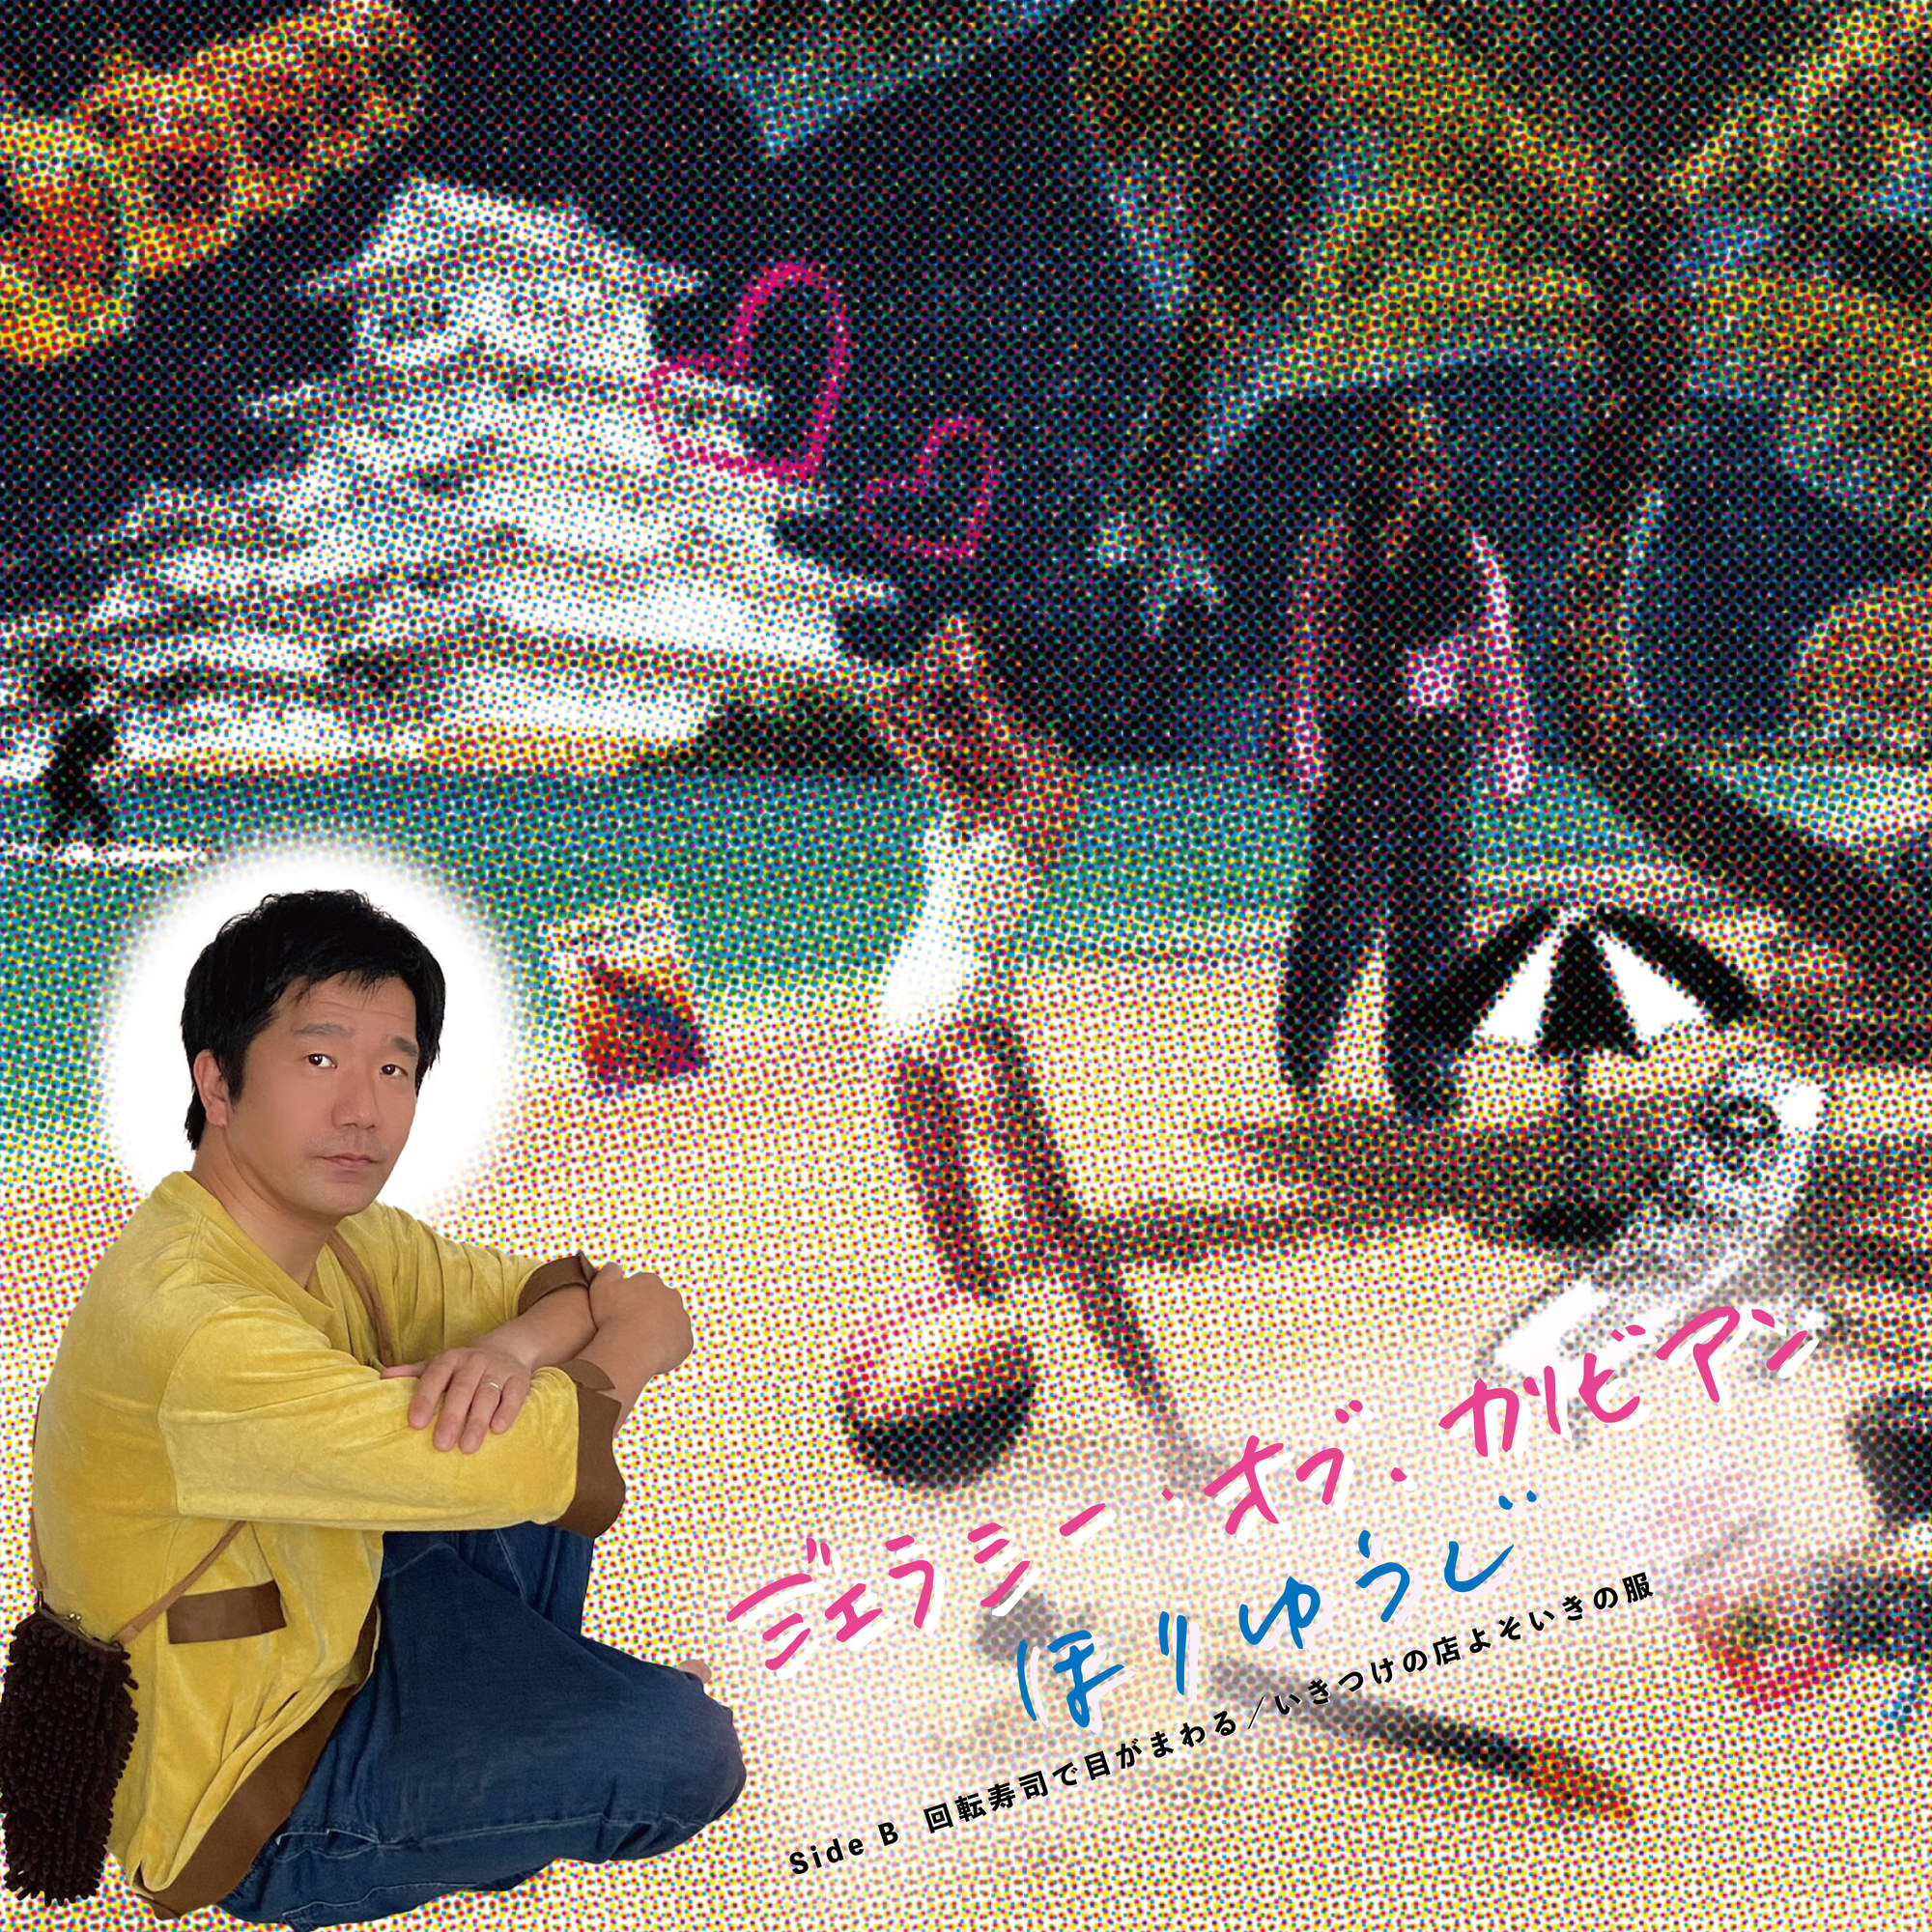 http://rose-records.jp/files/20210729154431.jpg